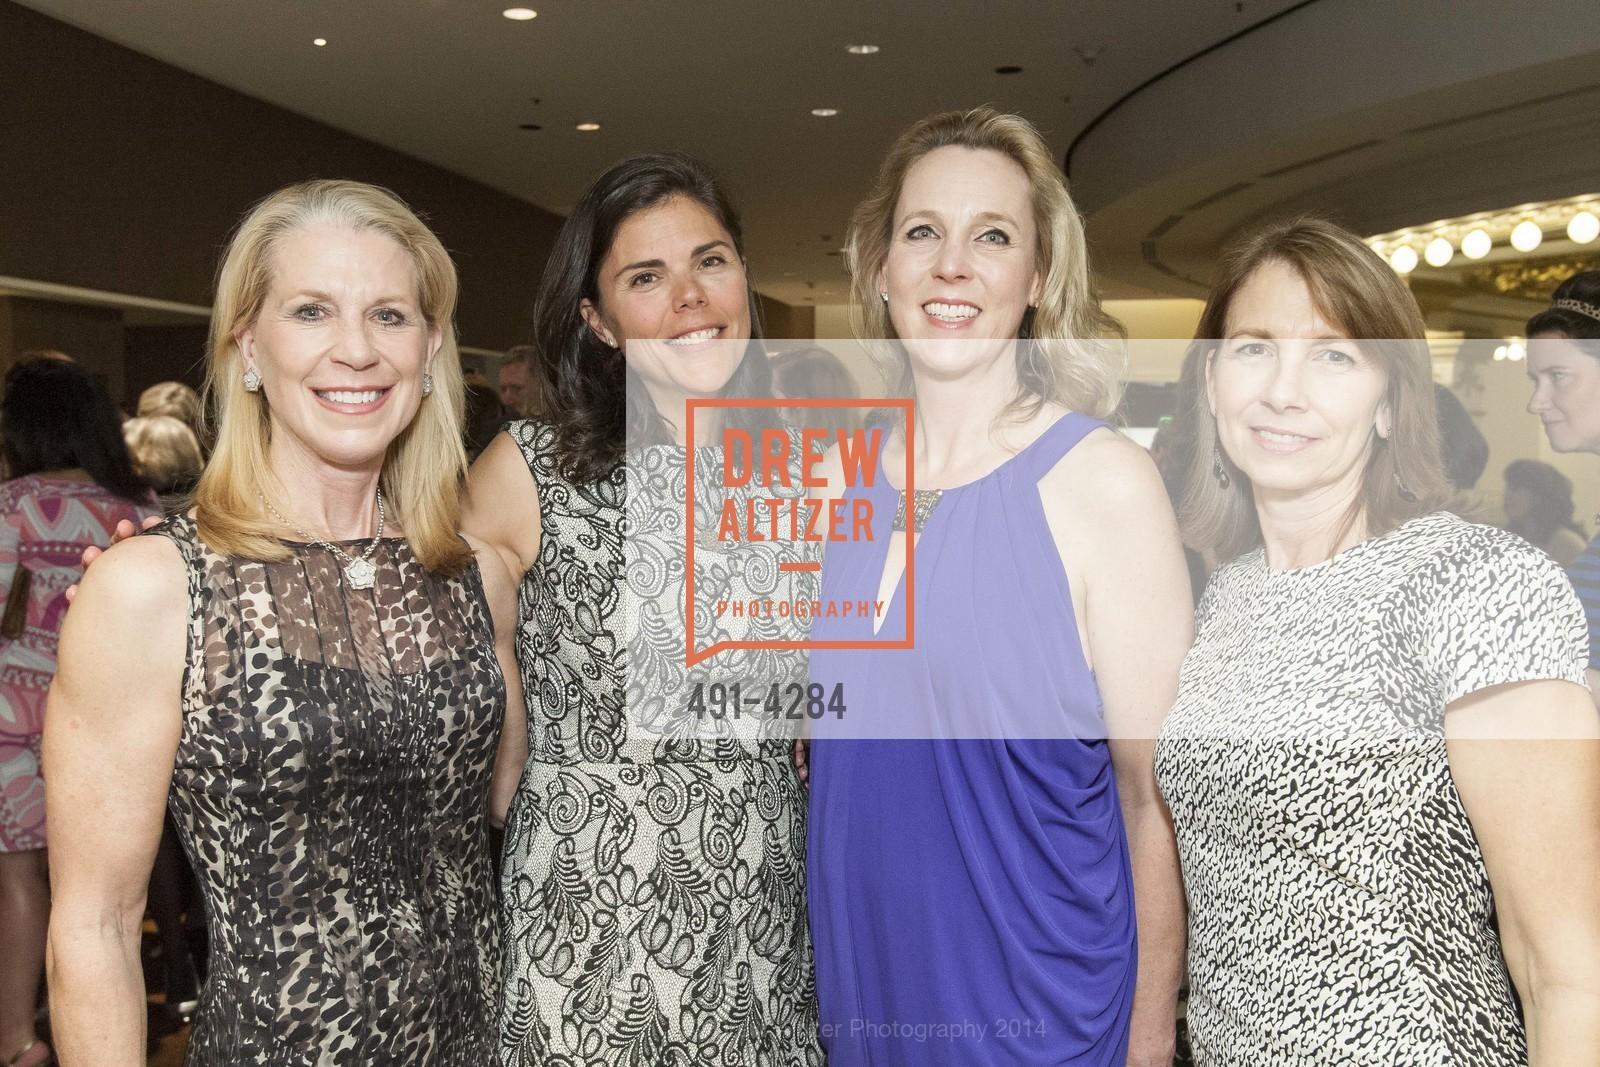 Kimberly Hopper, Tricia Knapp, Elizabeth Mitchell, Carol Louie, Photo #491-4284